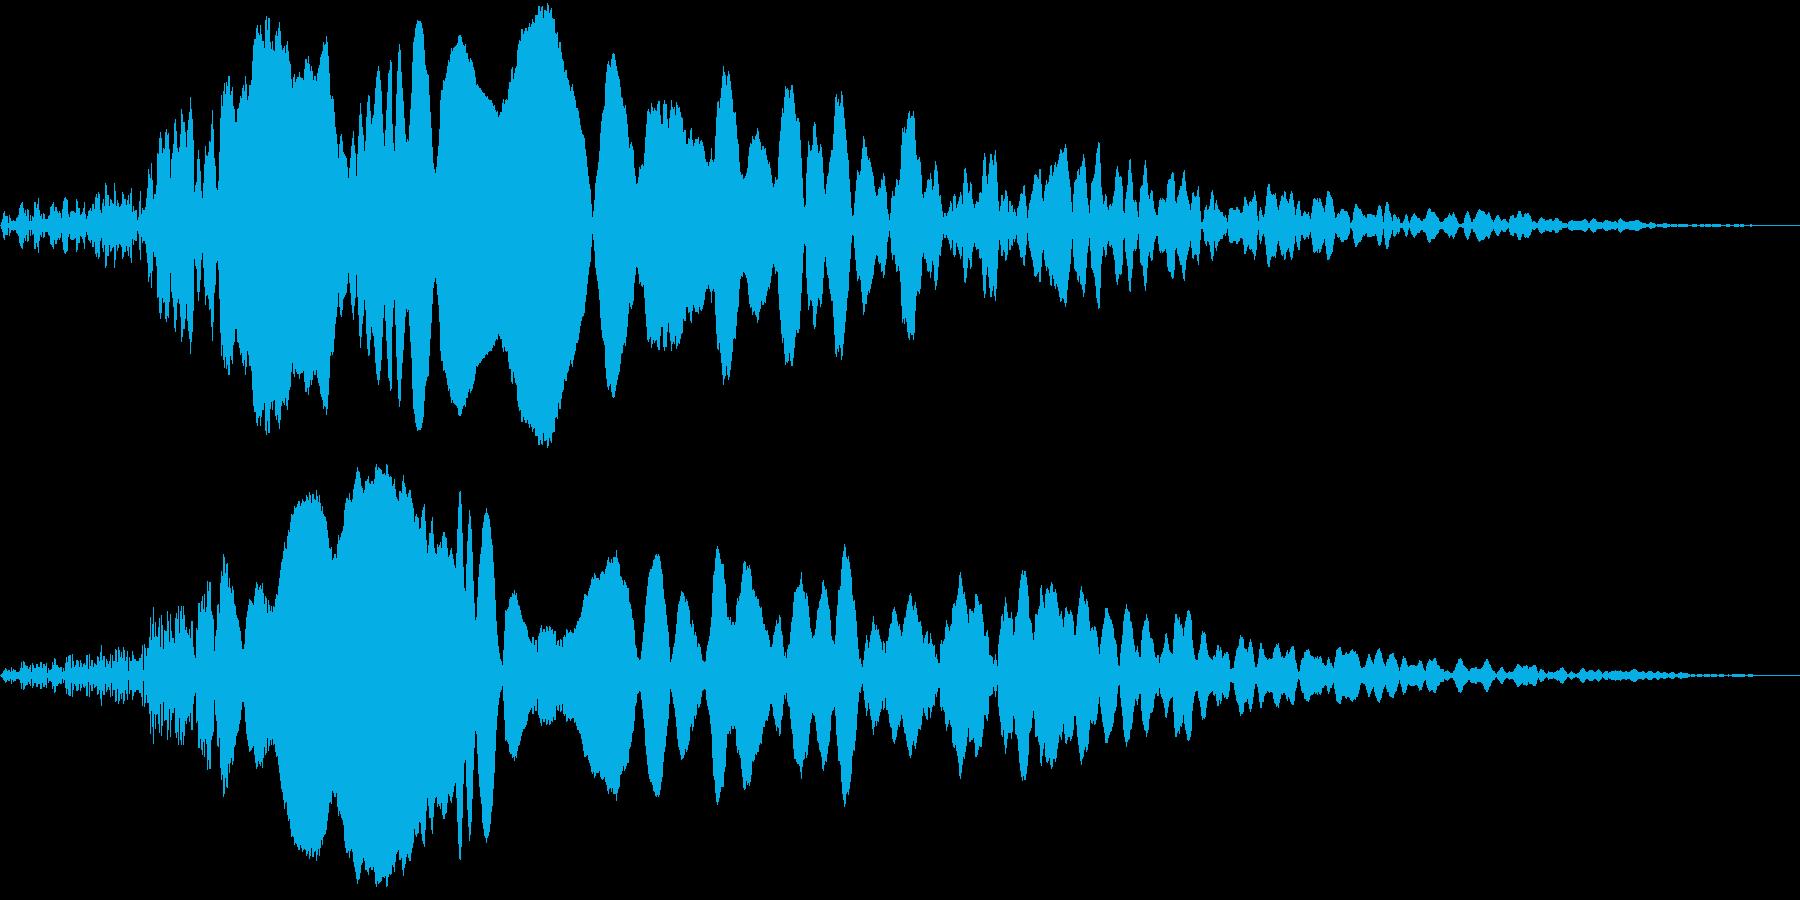 Animal 謎の生き物の静かな雄叫びの再生済みの波形